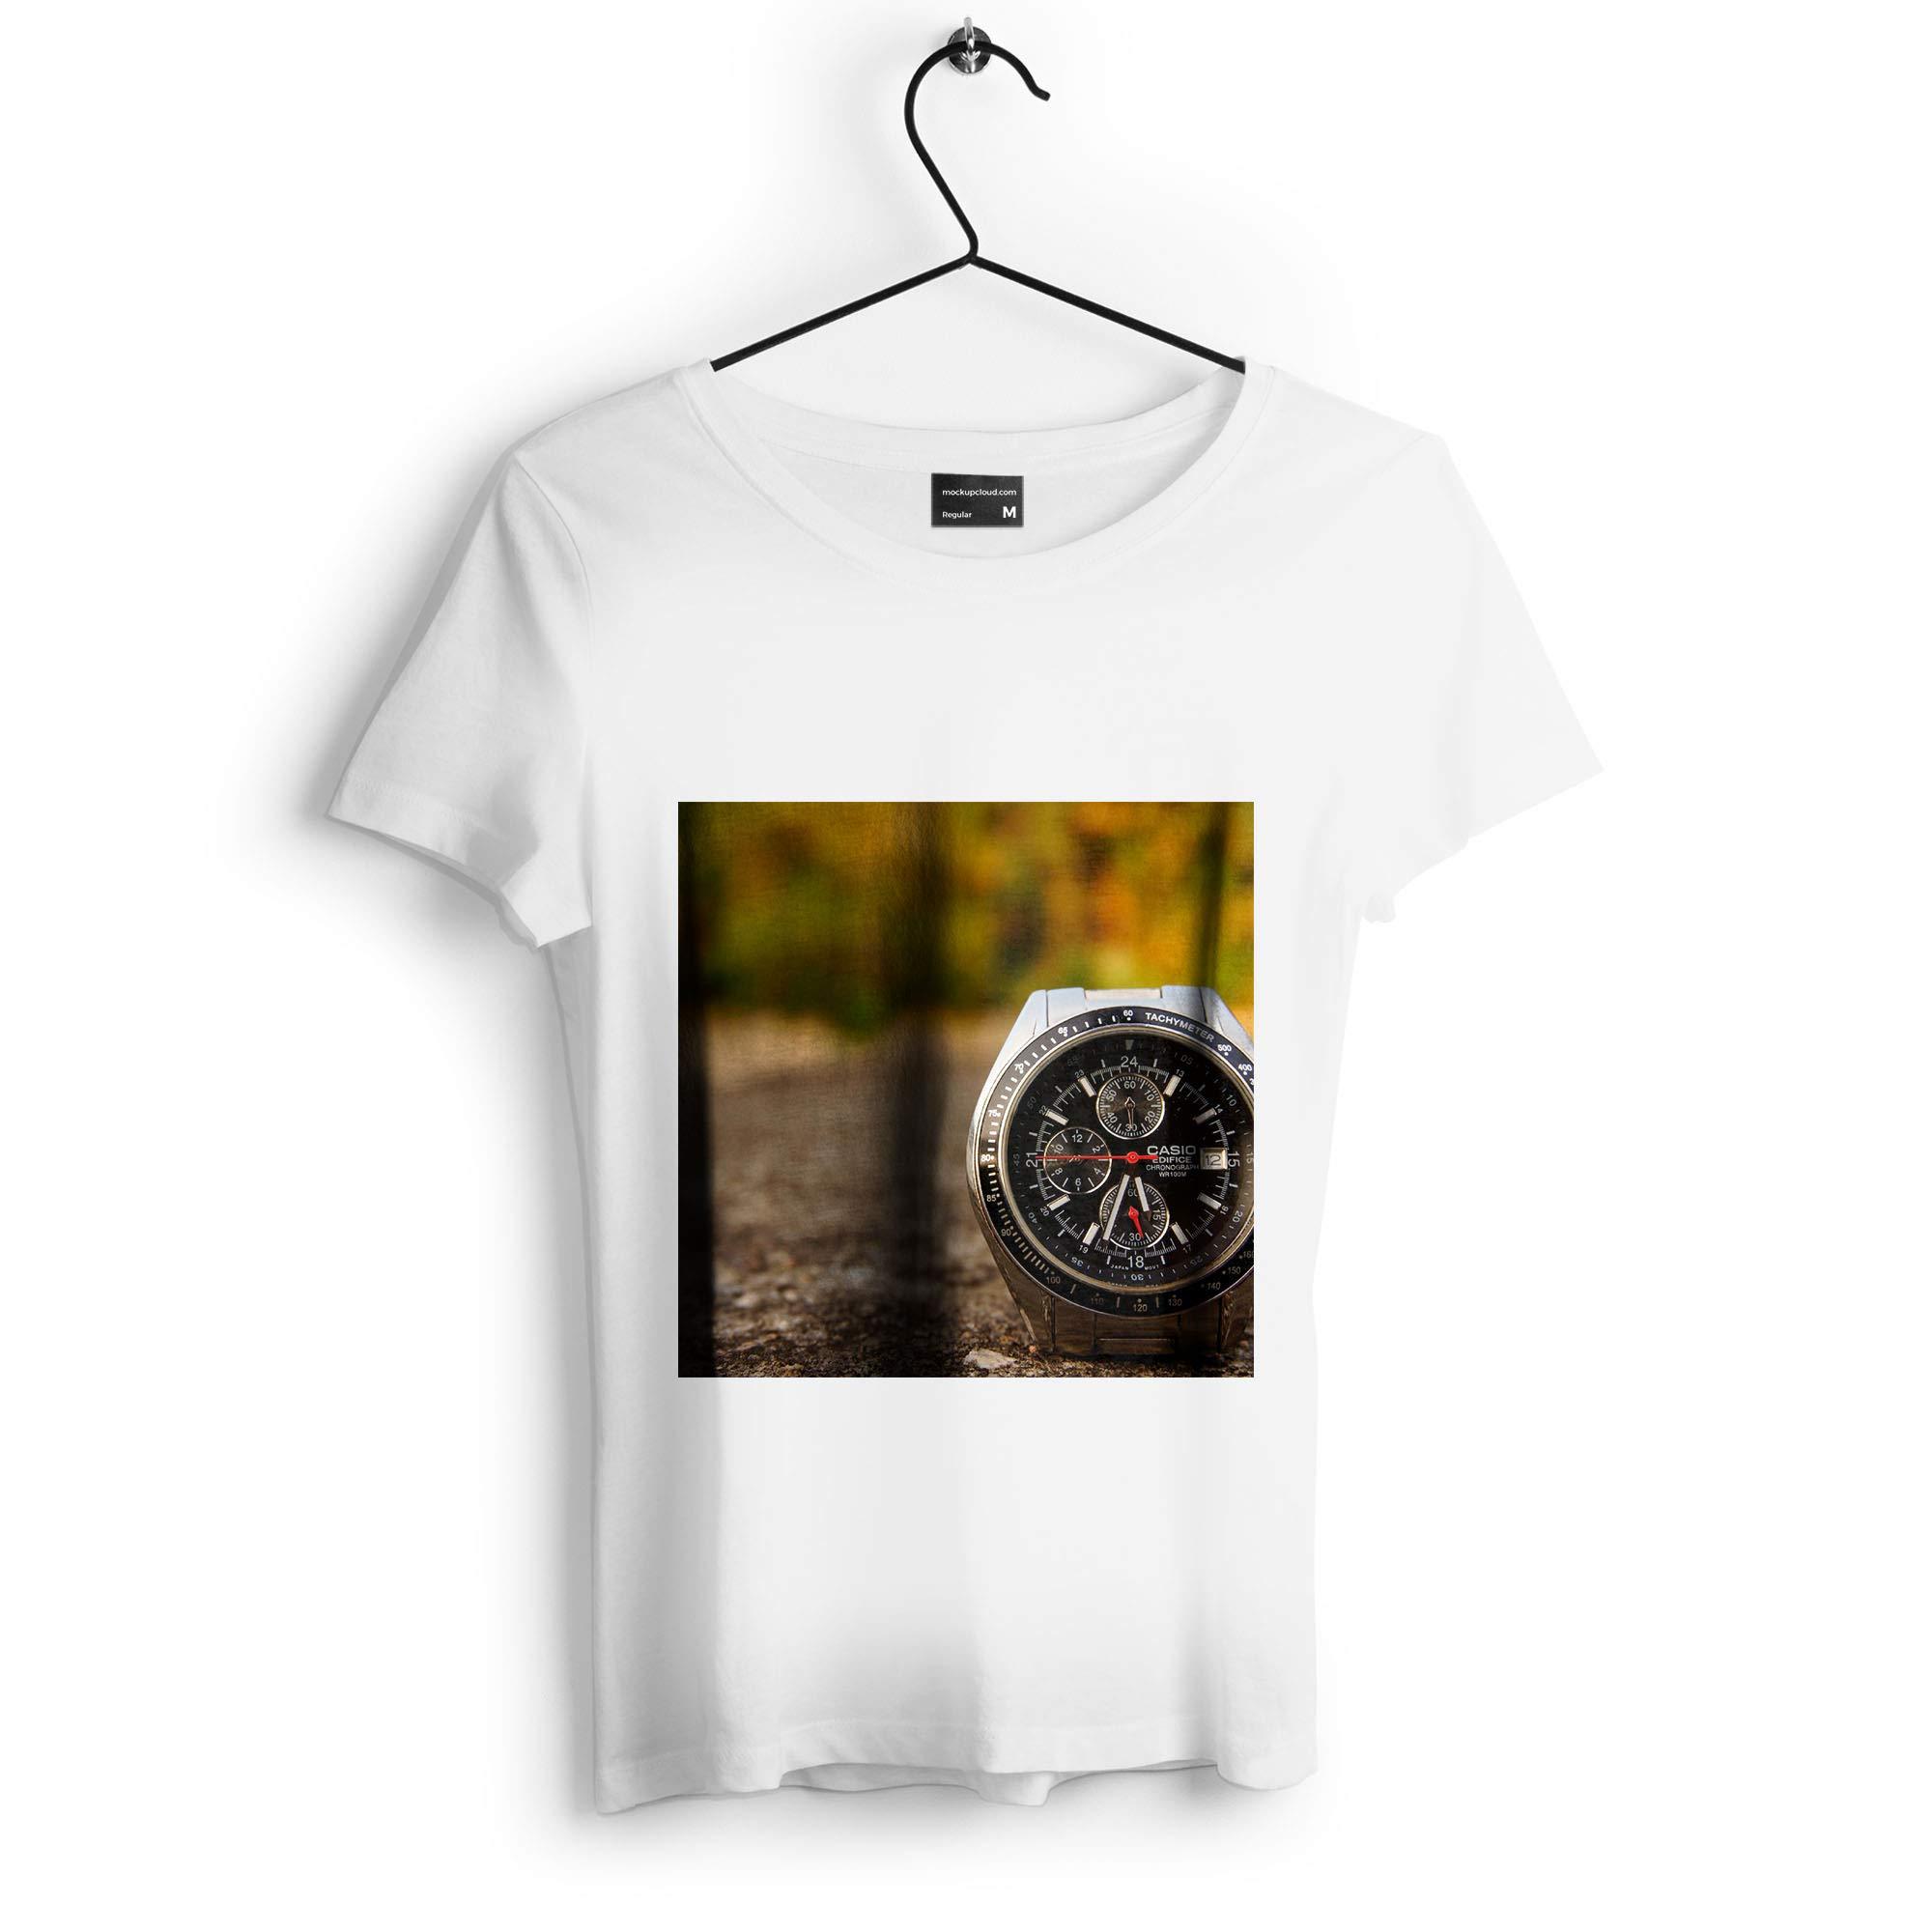 Westlake Art - Watch Casio - Unisex Tshirt - Picture Photography Artwork Shirt - White Adult Medium (D41D8) by Westlake Art